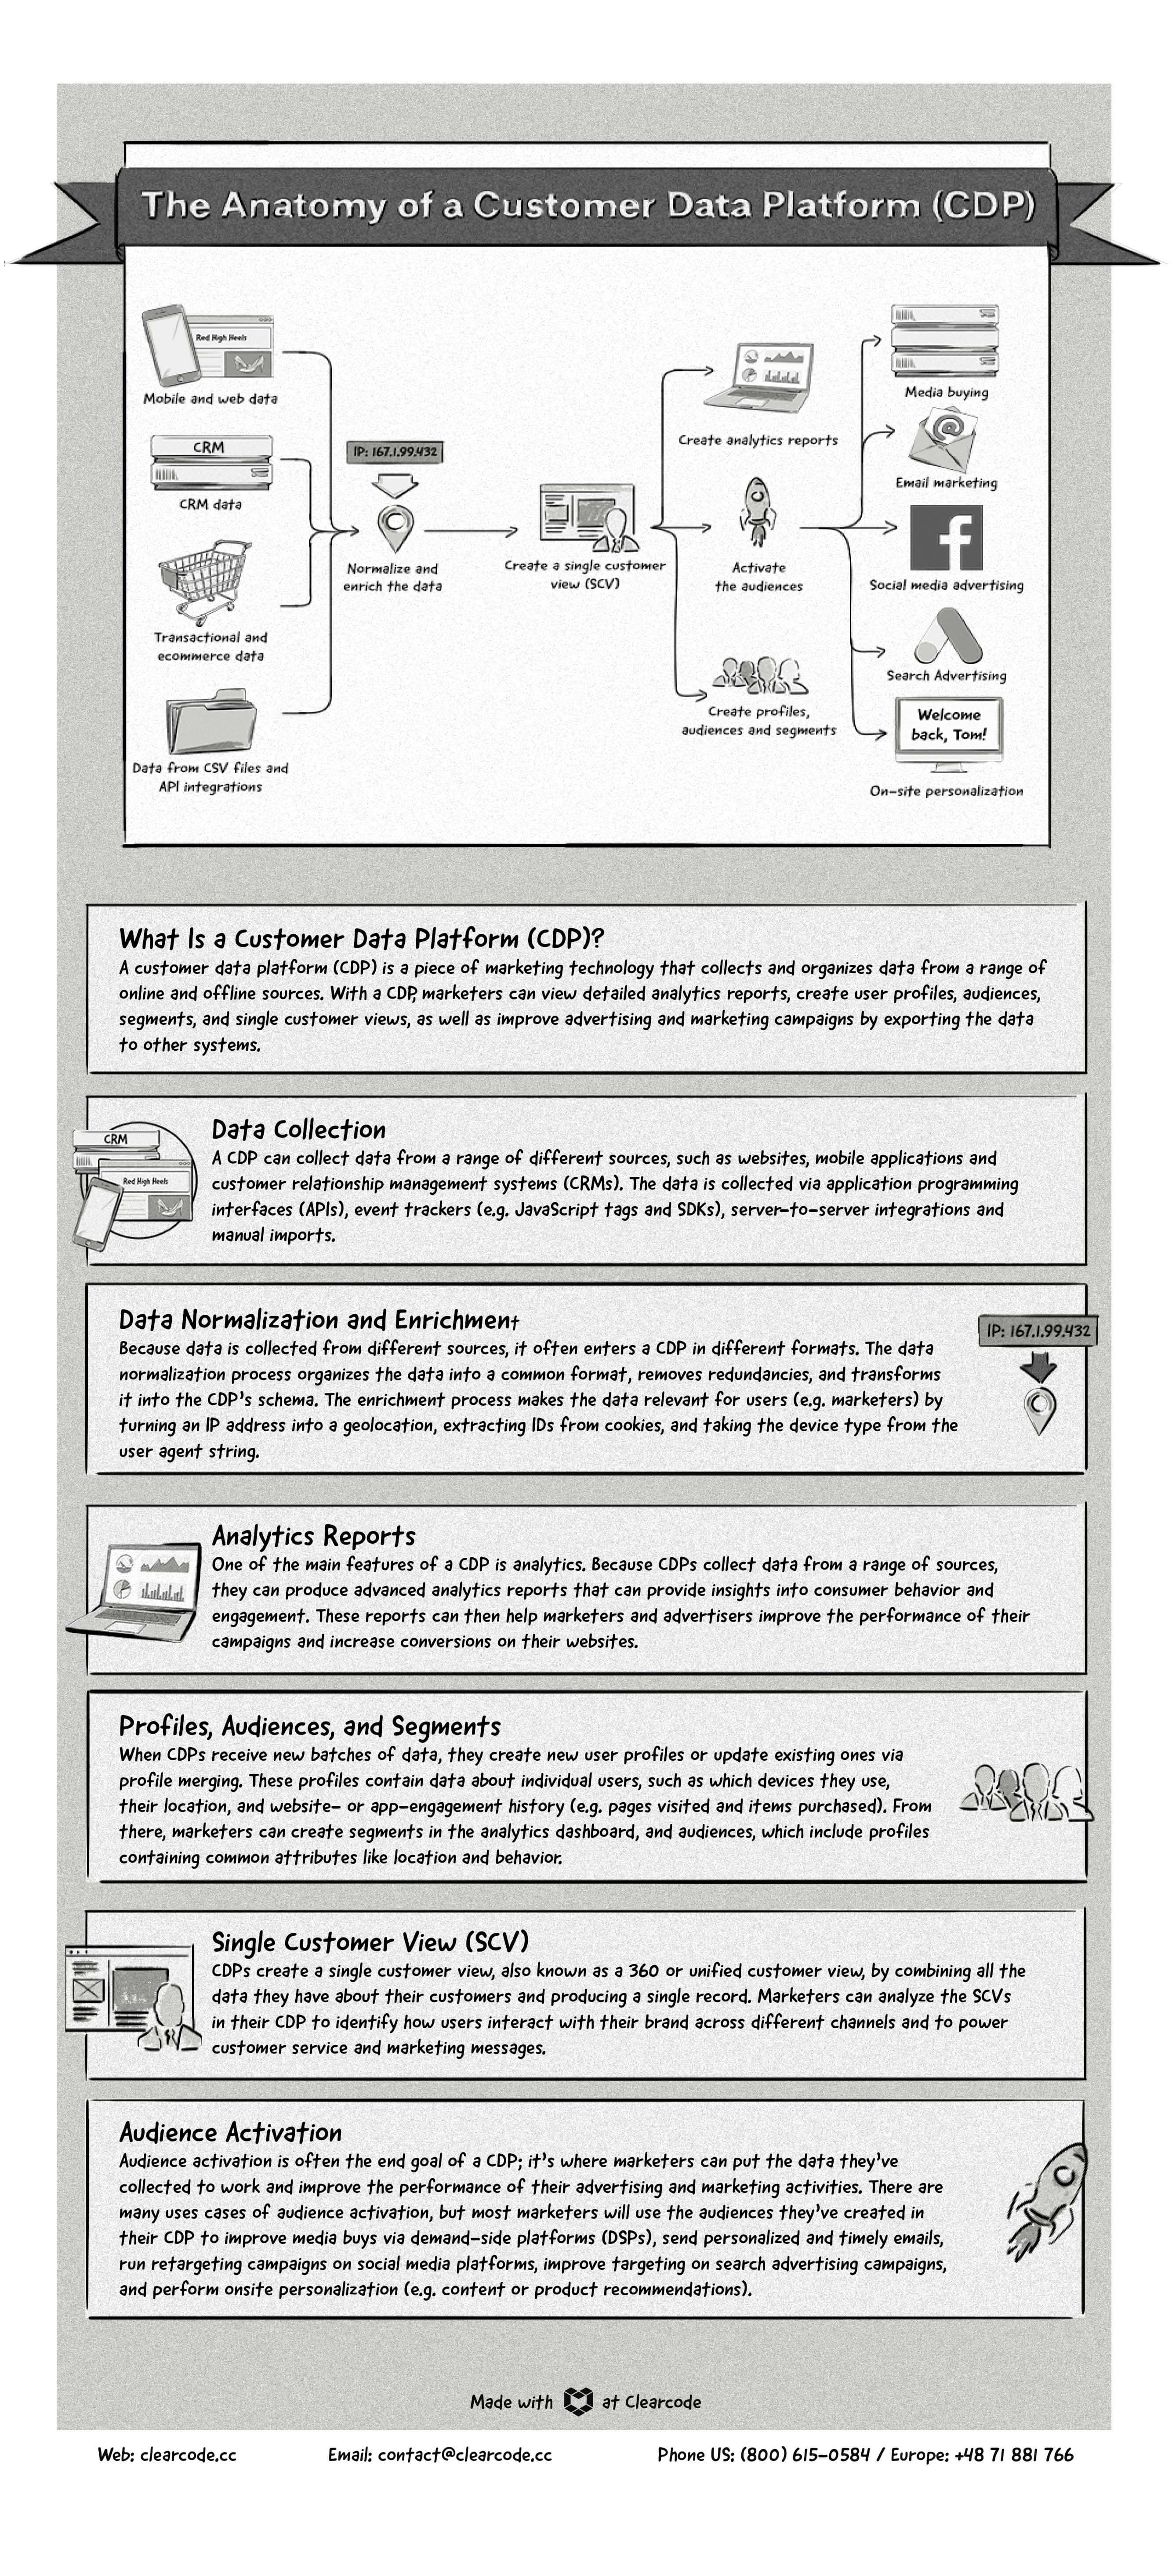 The Anatomy of a Customer Data Platform (CDP) infographic